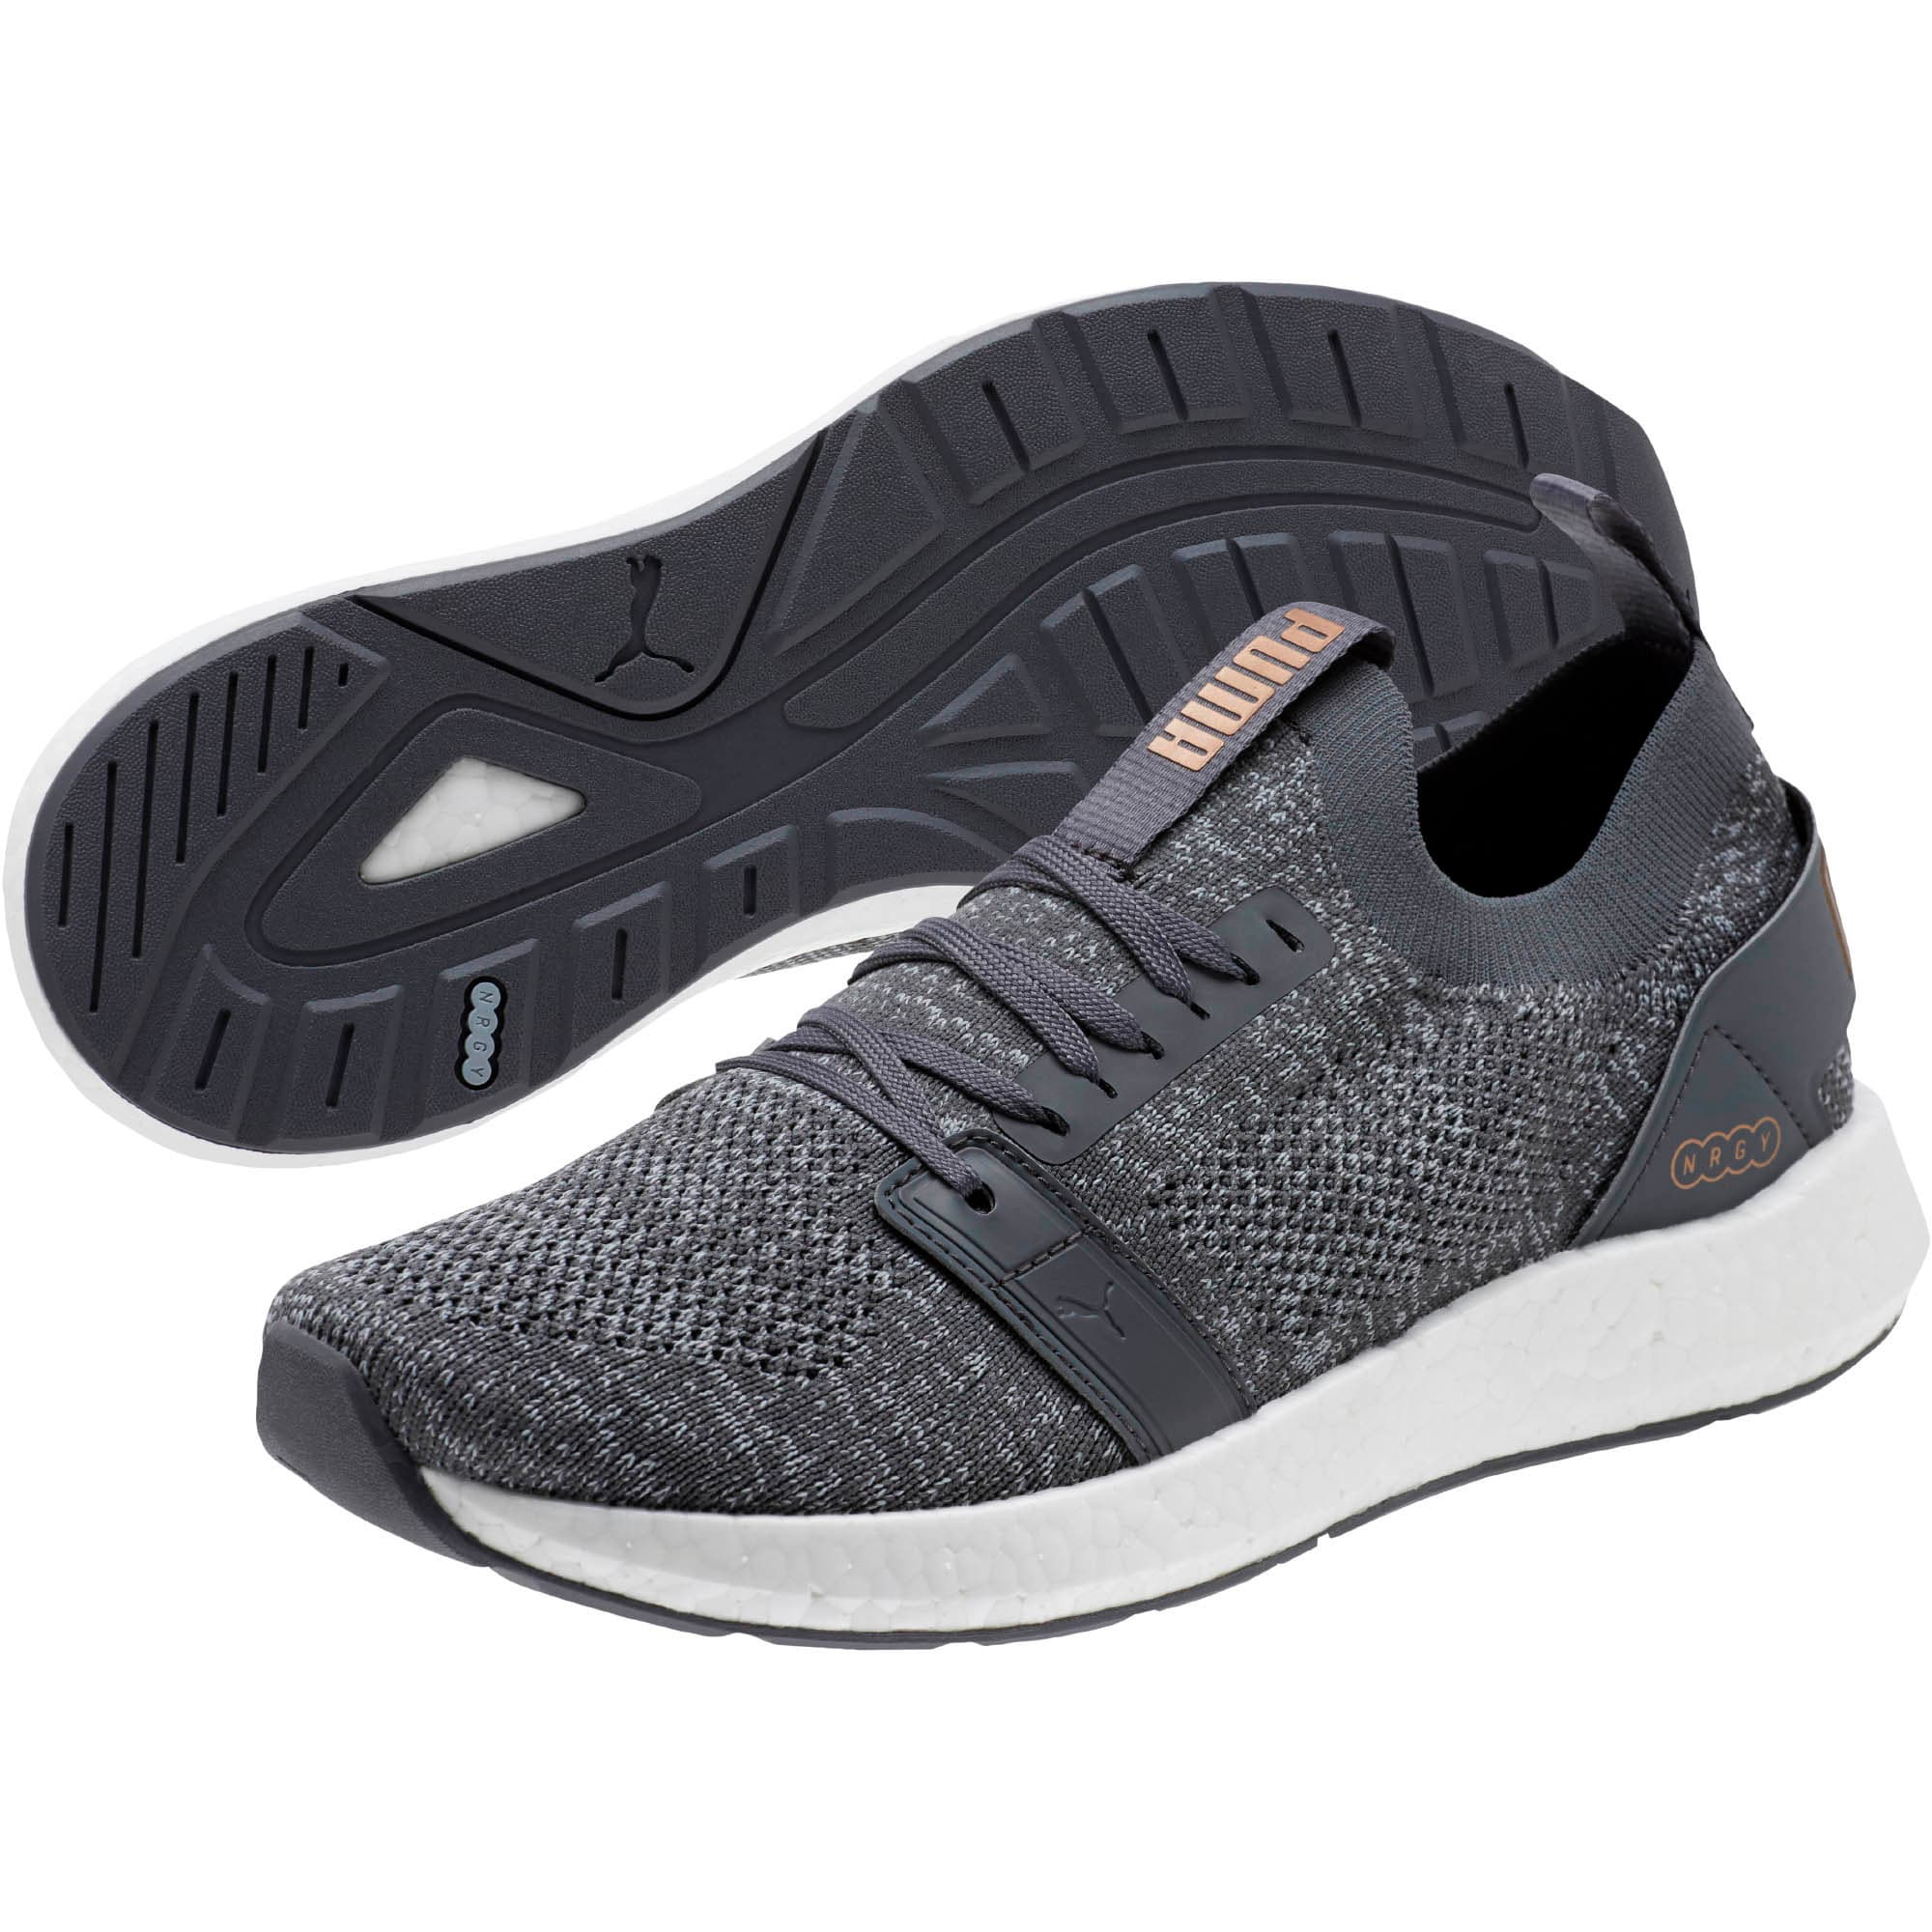 Thumbnail 2 of NRGY Neko Engineer Knit Women's Running Shoes, IronGate-Quarry-MtllicBrnze, medium